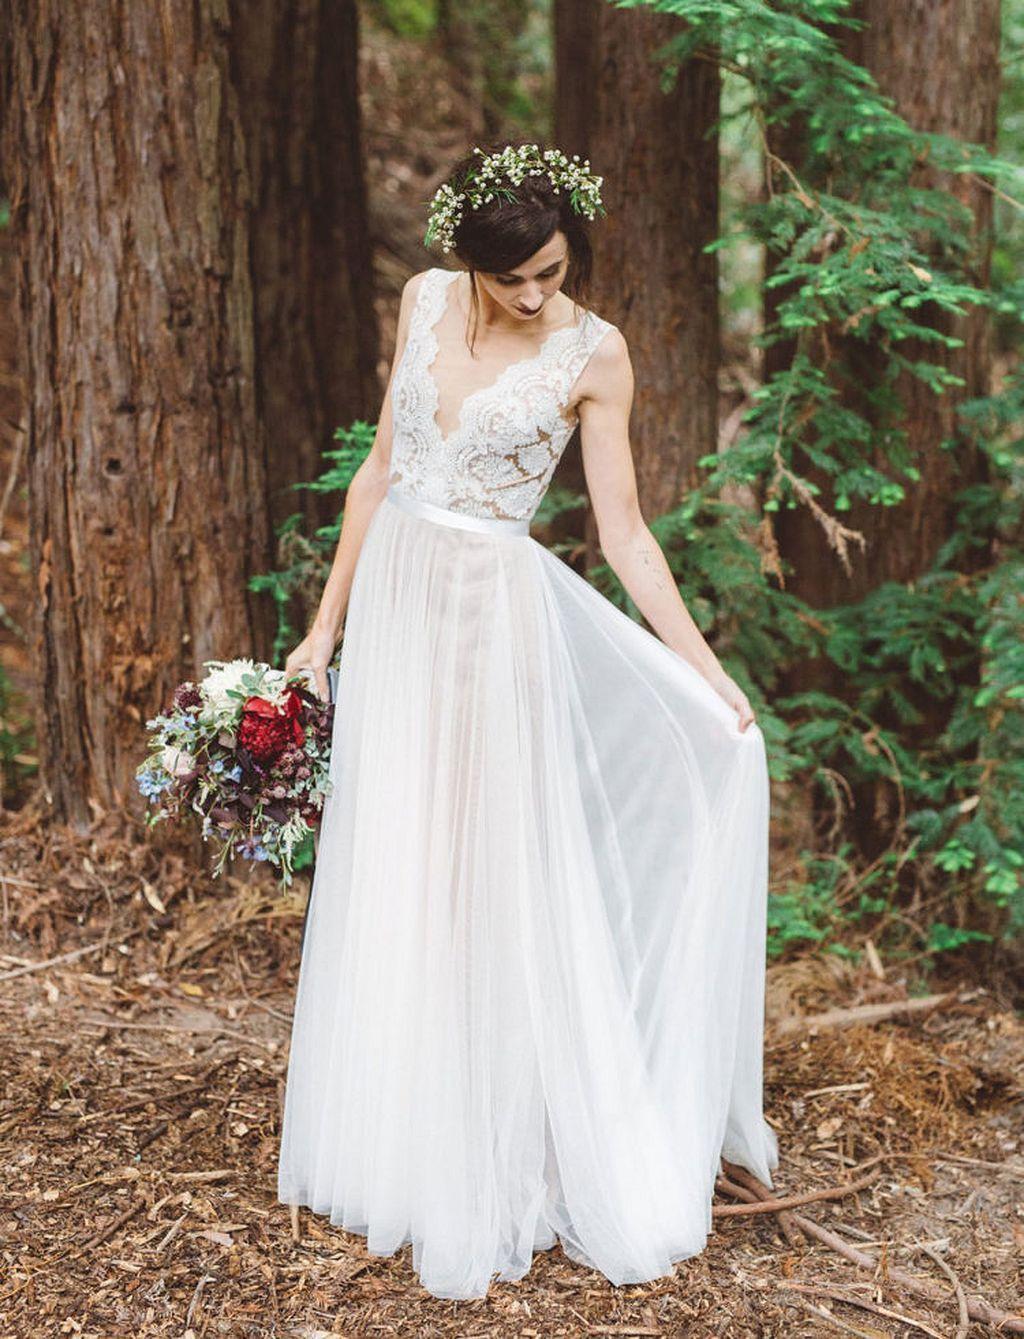 Woodland wedding dress  Pin by Wedding Magazine on Wedding Dress u Attire  Pinterest